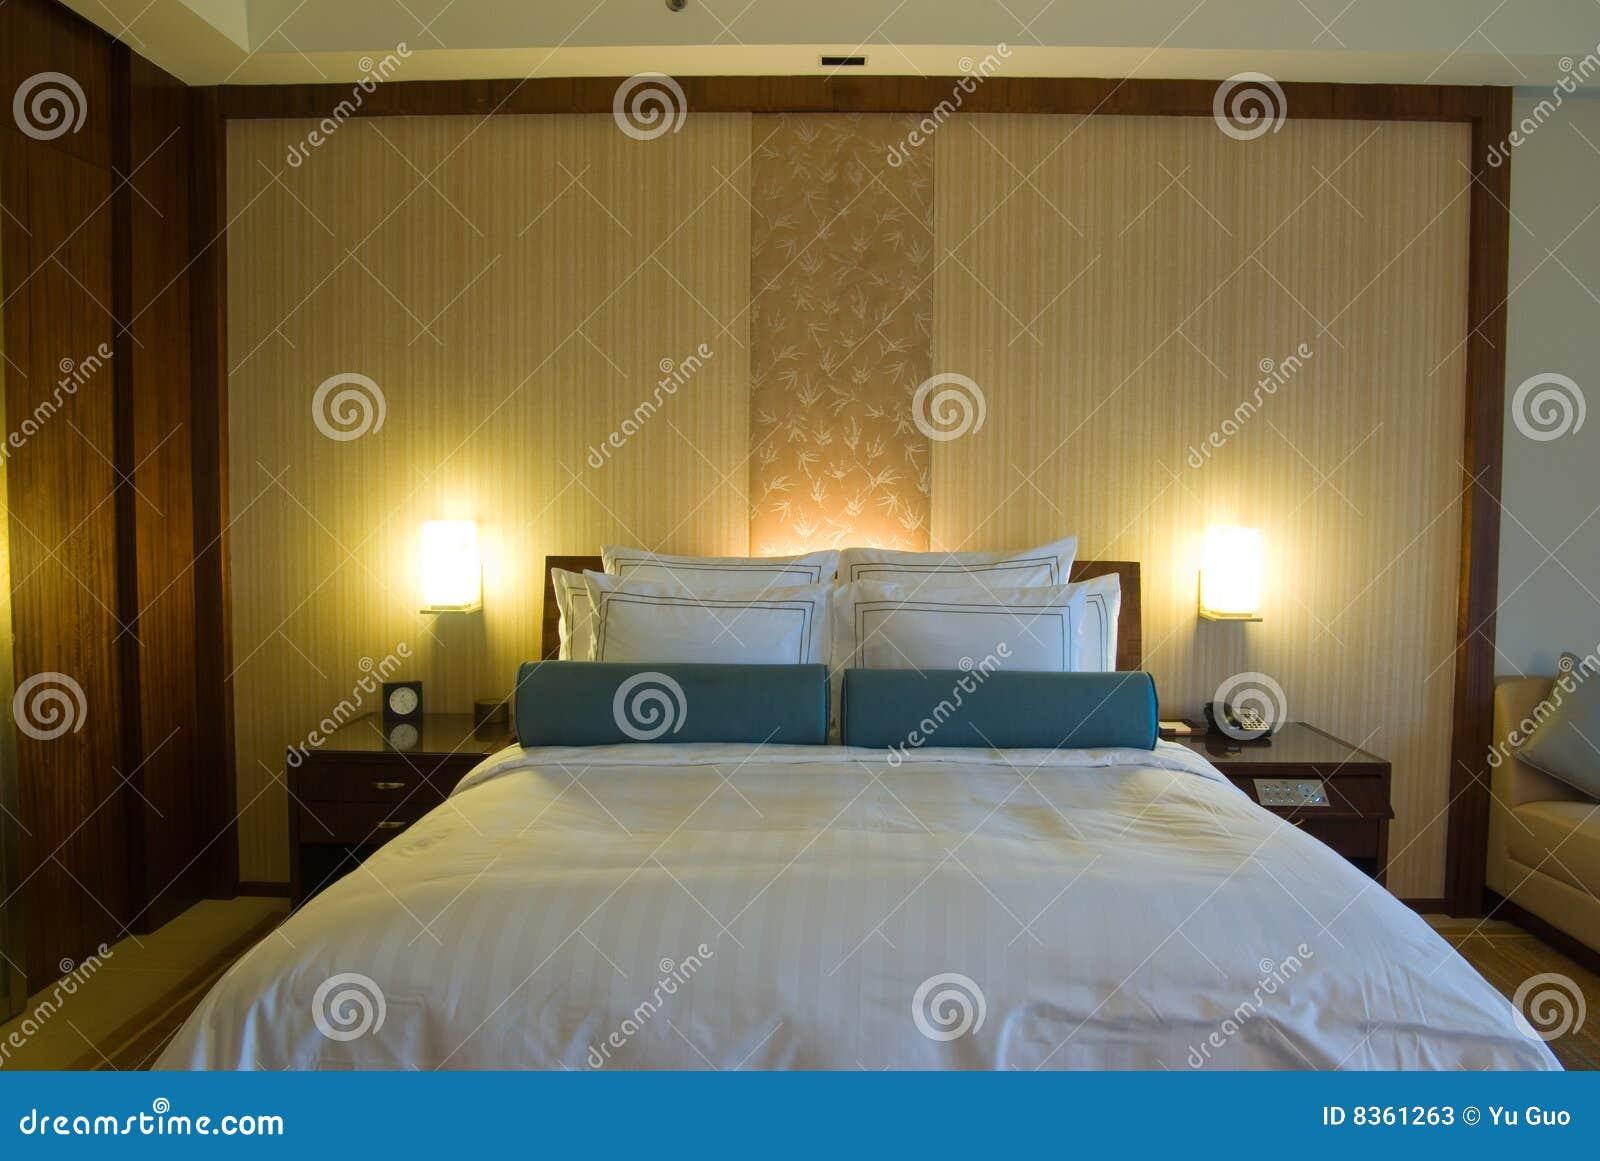 Ritz-Carlton hotel room